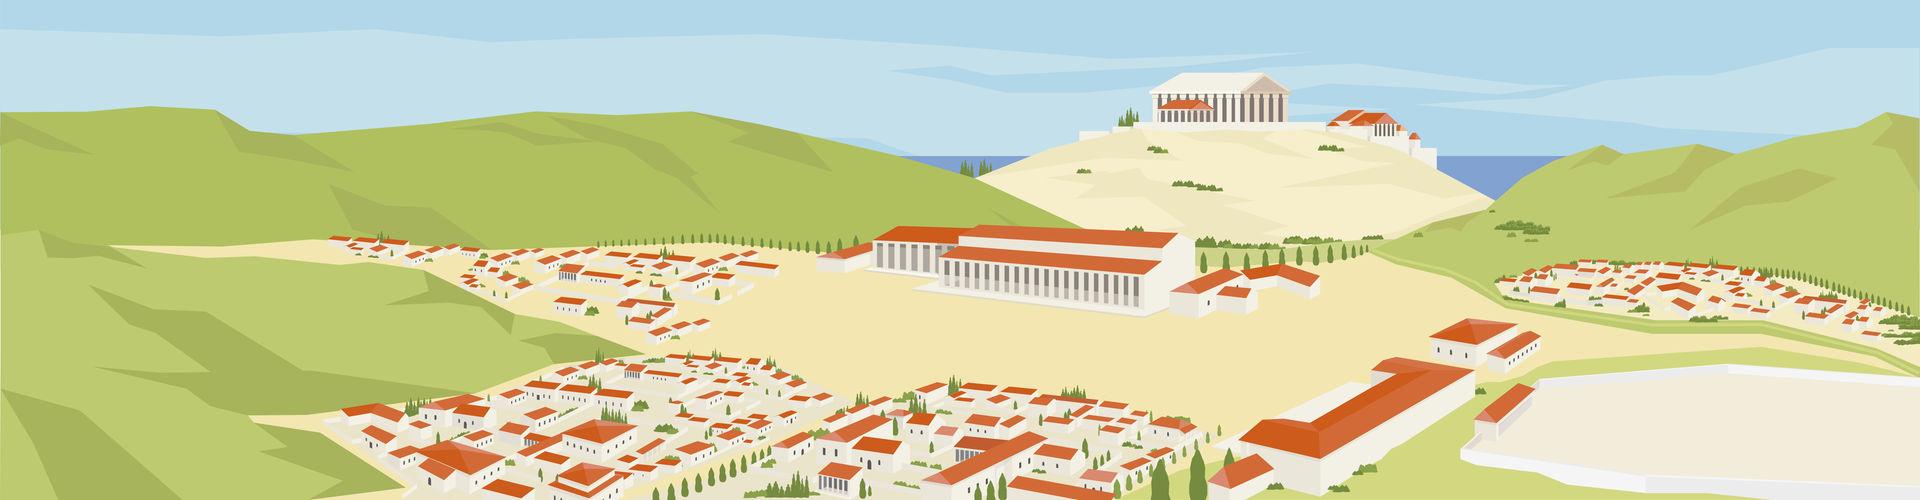 Source image : https://stillmed.olympic.org/media/Images/OlympicOrg/Games/Ancient_Olympic_Games/1_ville_jeux_3840x1000.jpg?interpolation=lanczos-none&resize=1920:500